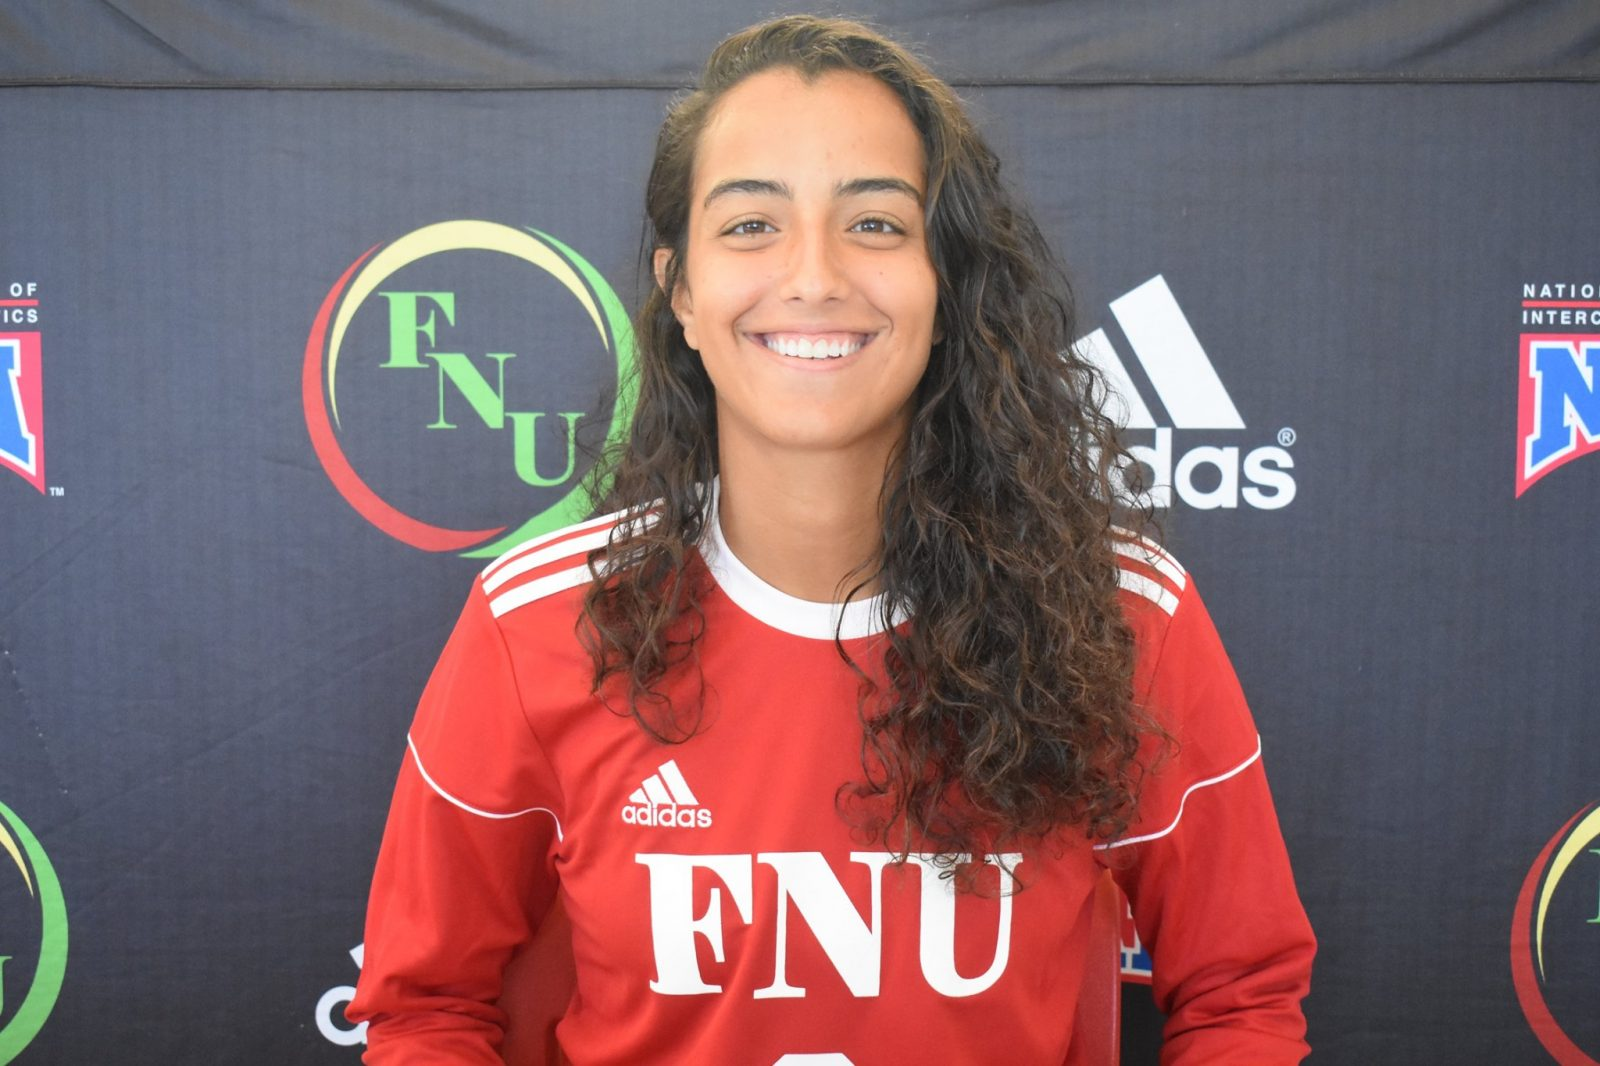 FNU Women's soccer player Lais Marques Falcao